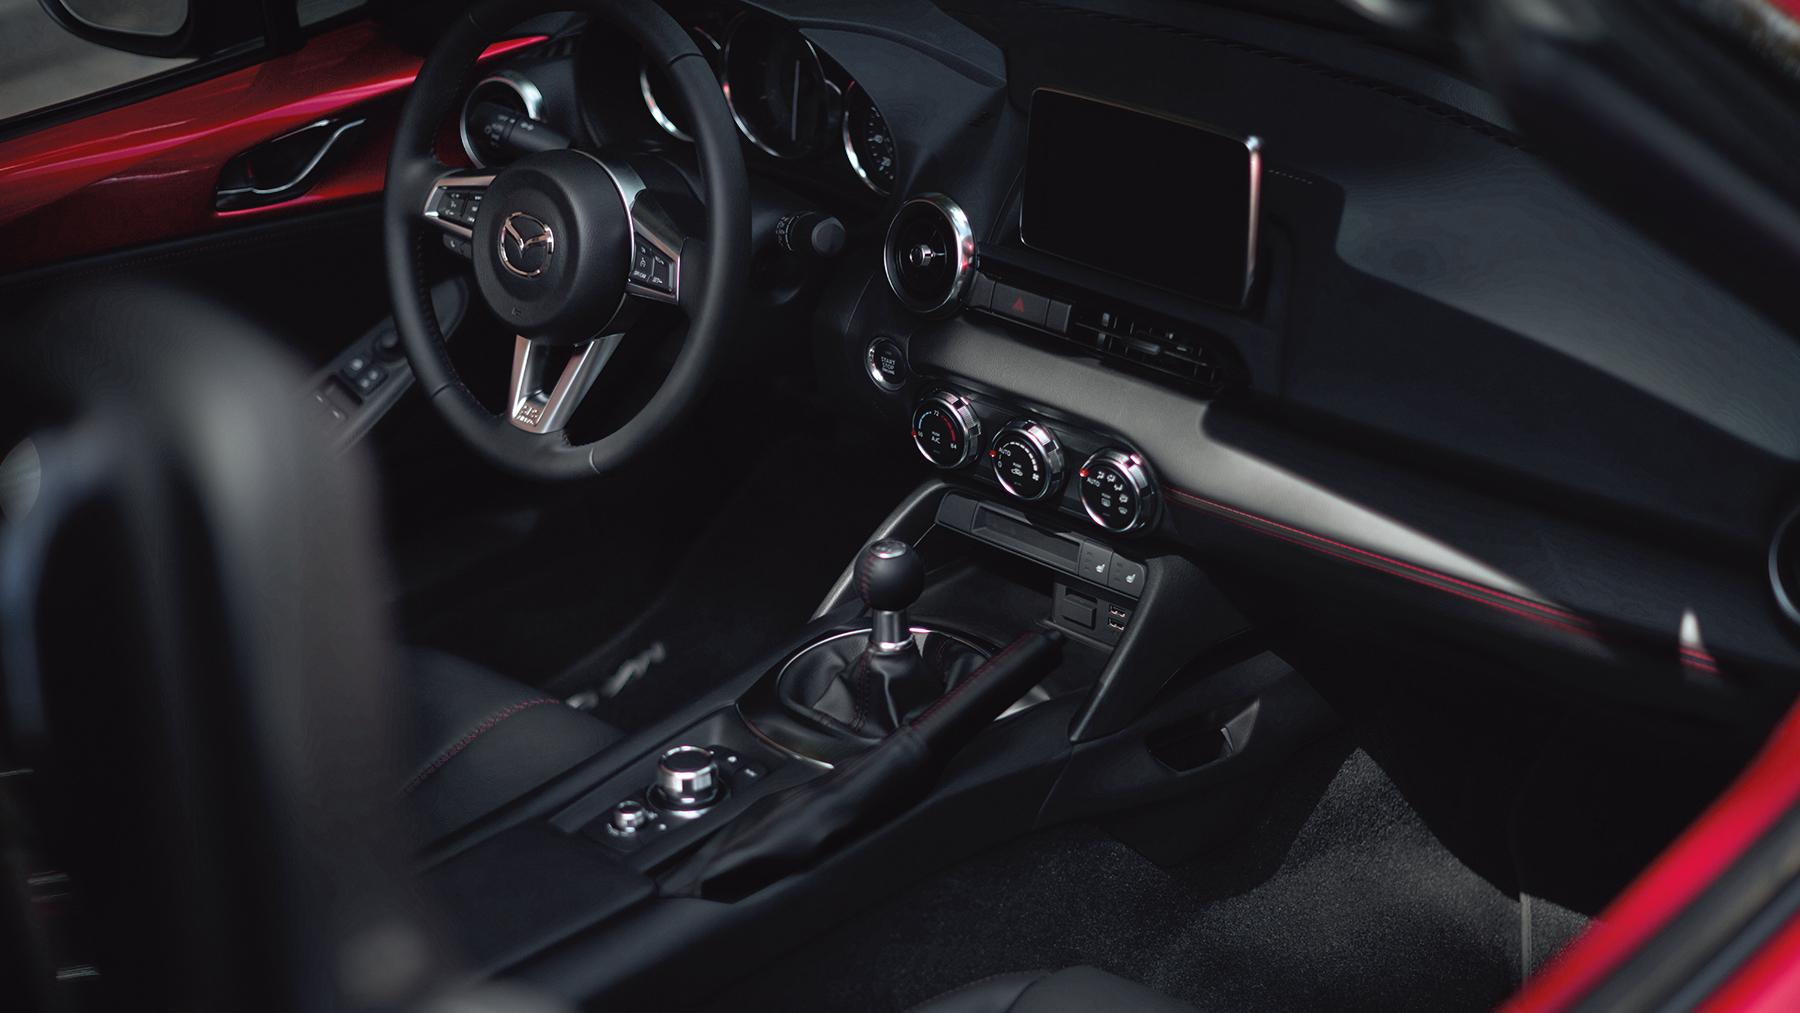 2019 Mazda MX-5 Miata Cockpit